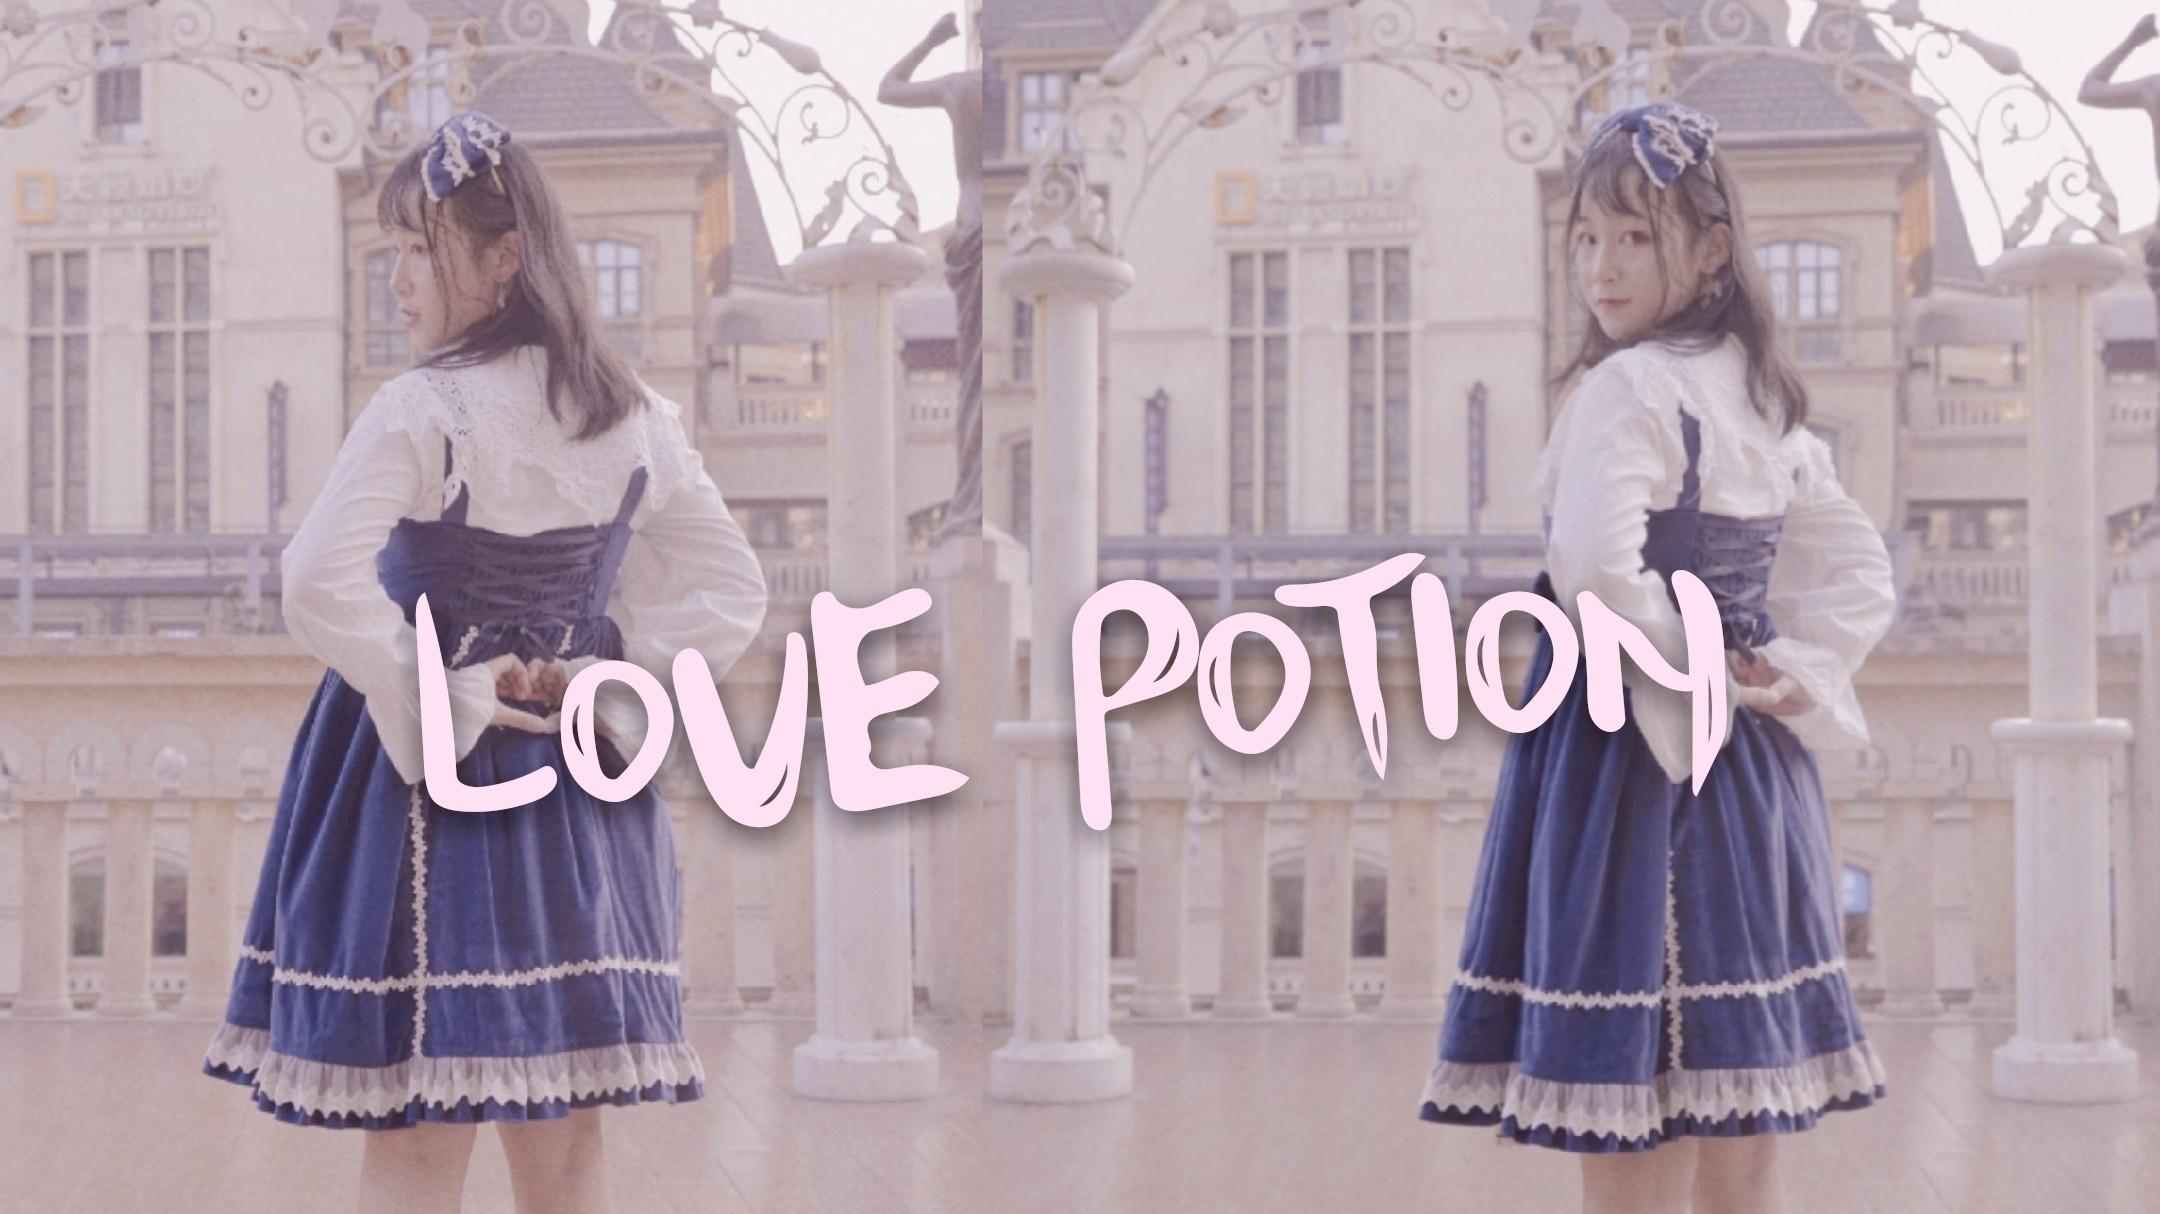 【Lolita】#LO裙蕉友# Love Potion♪点击收获澪姬的爱情药水吧♡